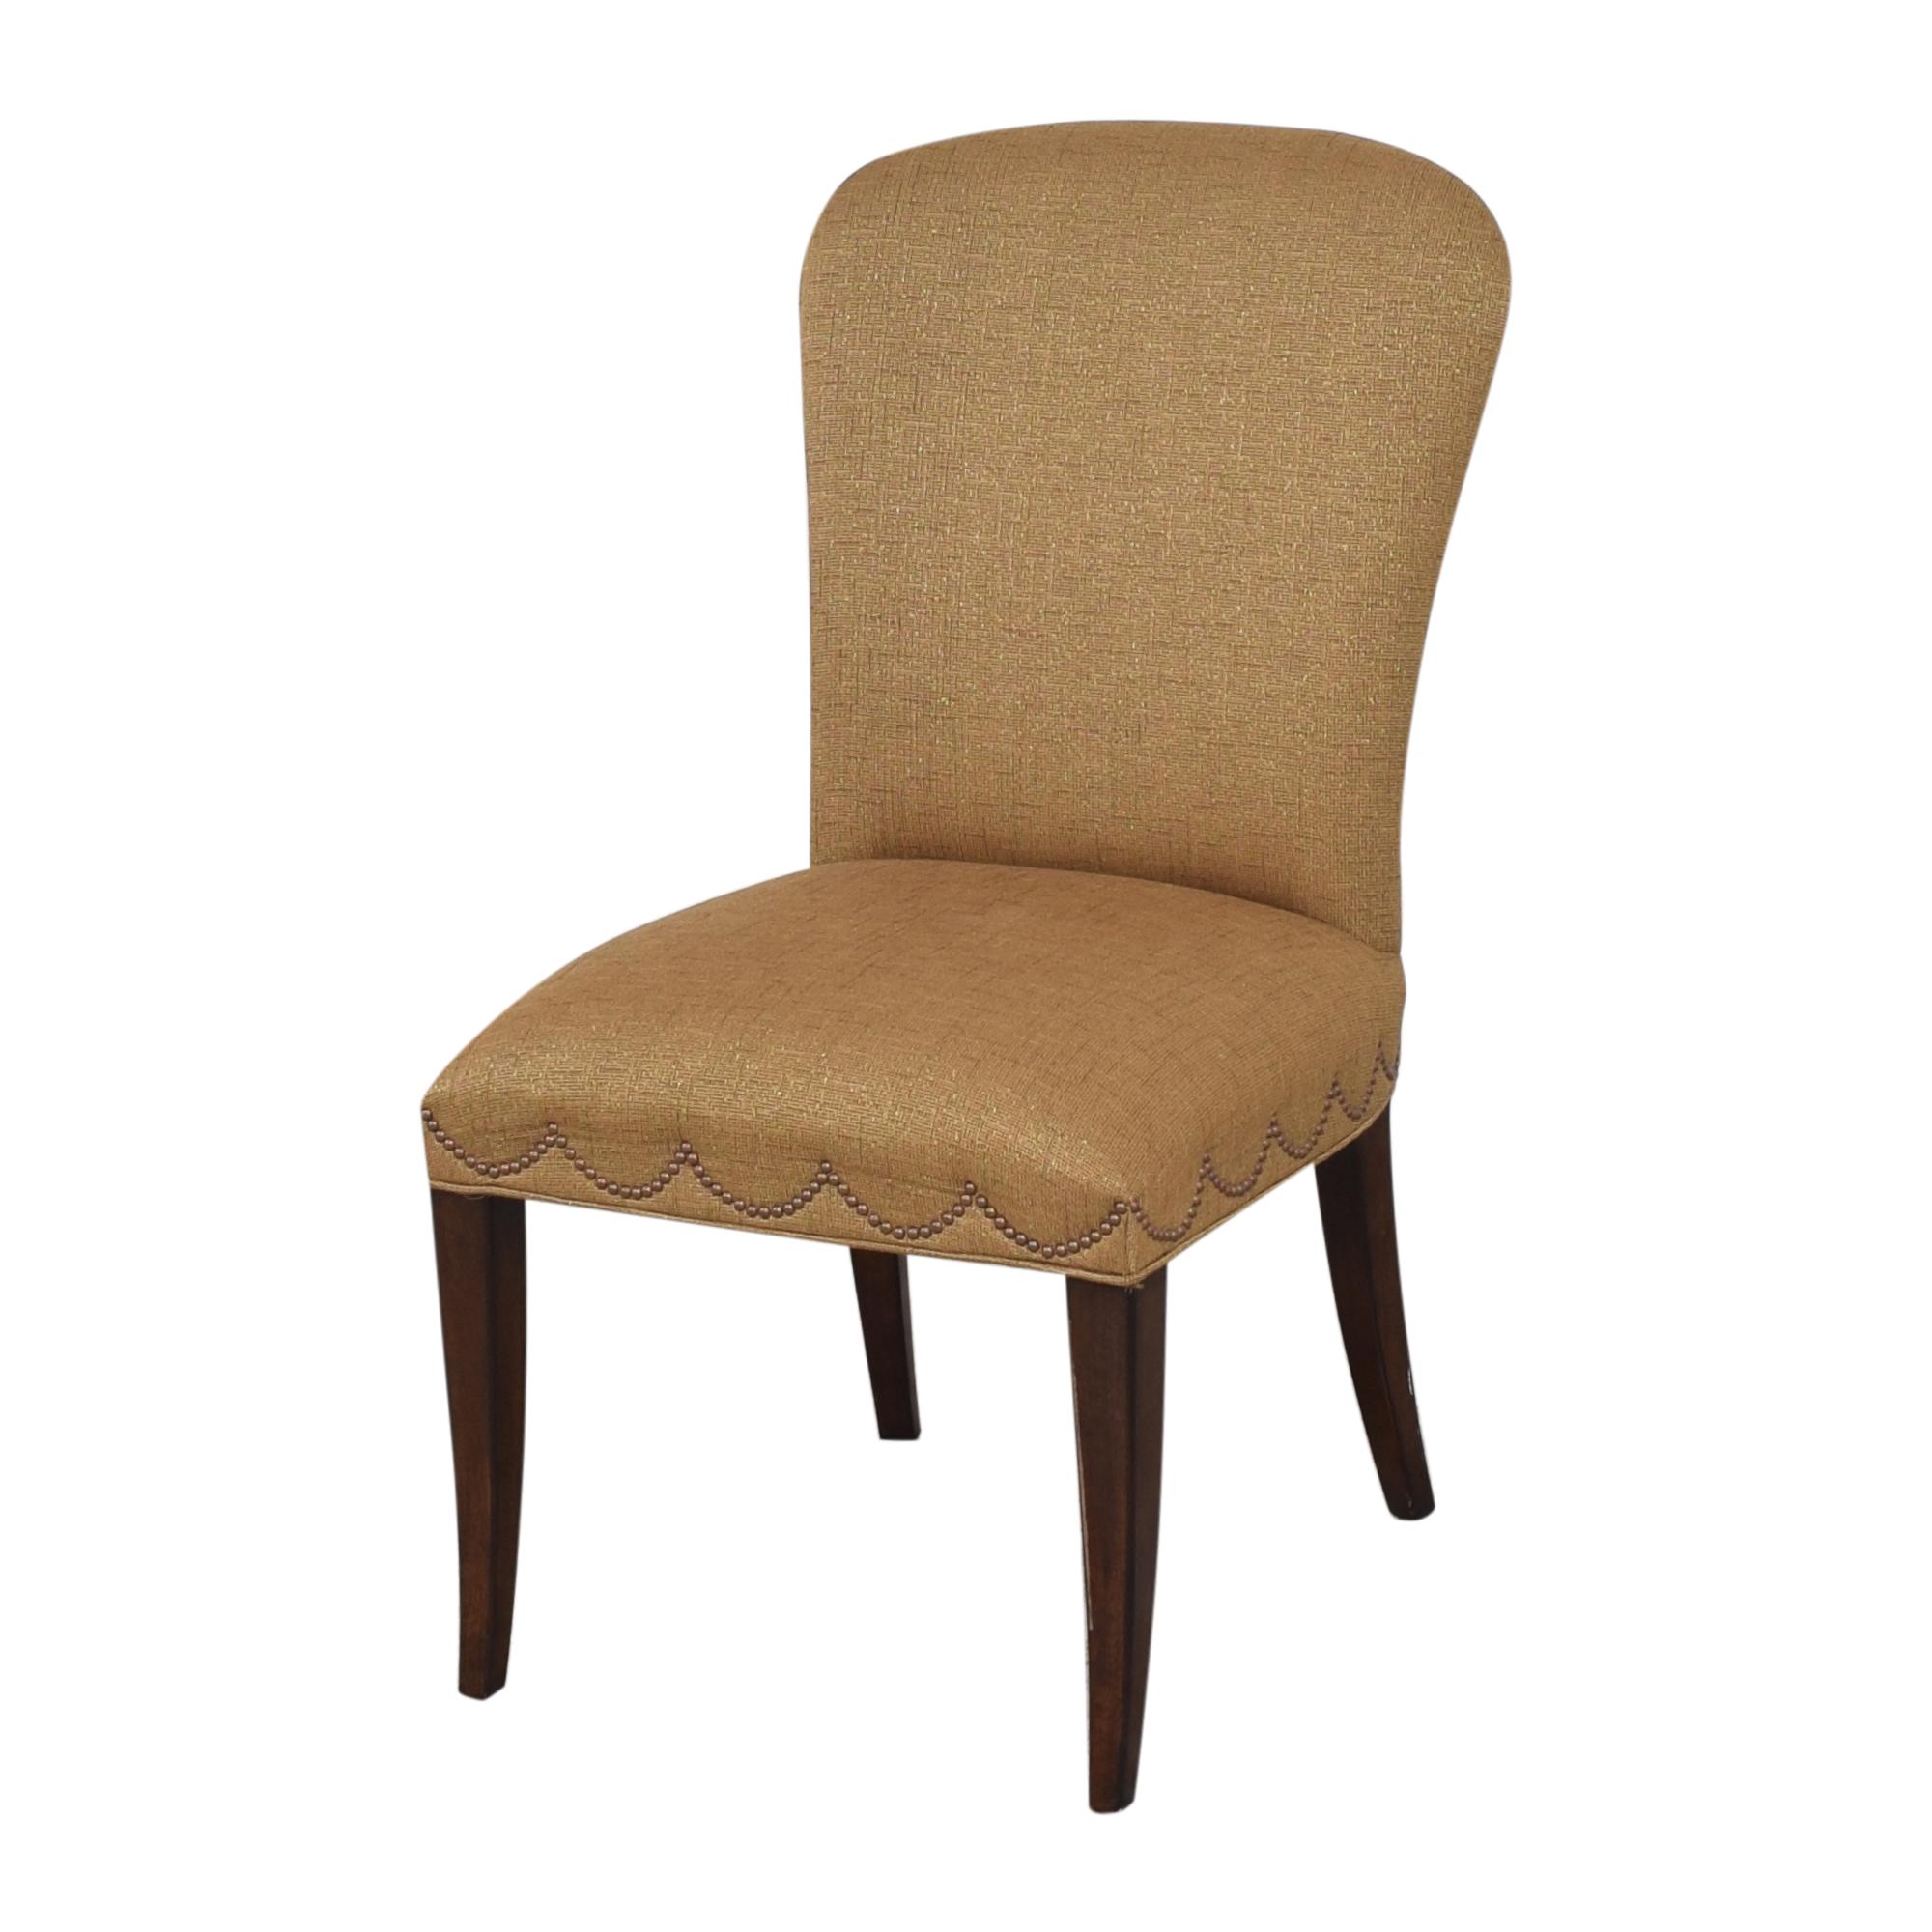 buy Furniture Brands International Furniture Brands International Scalloped Nailhead Dining Chairs online